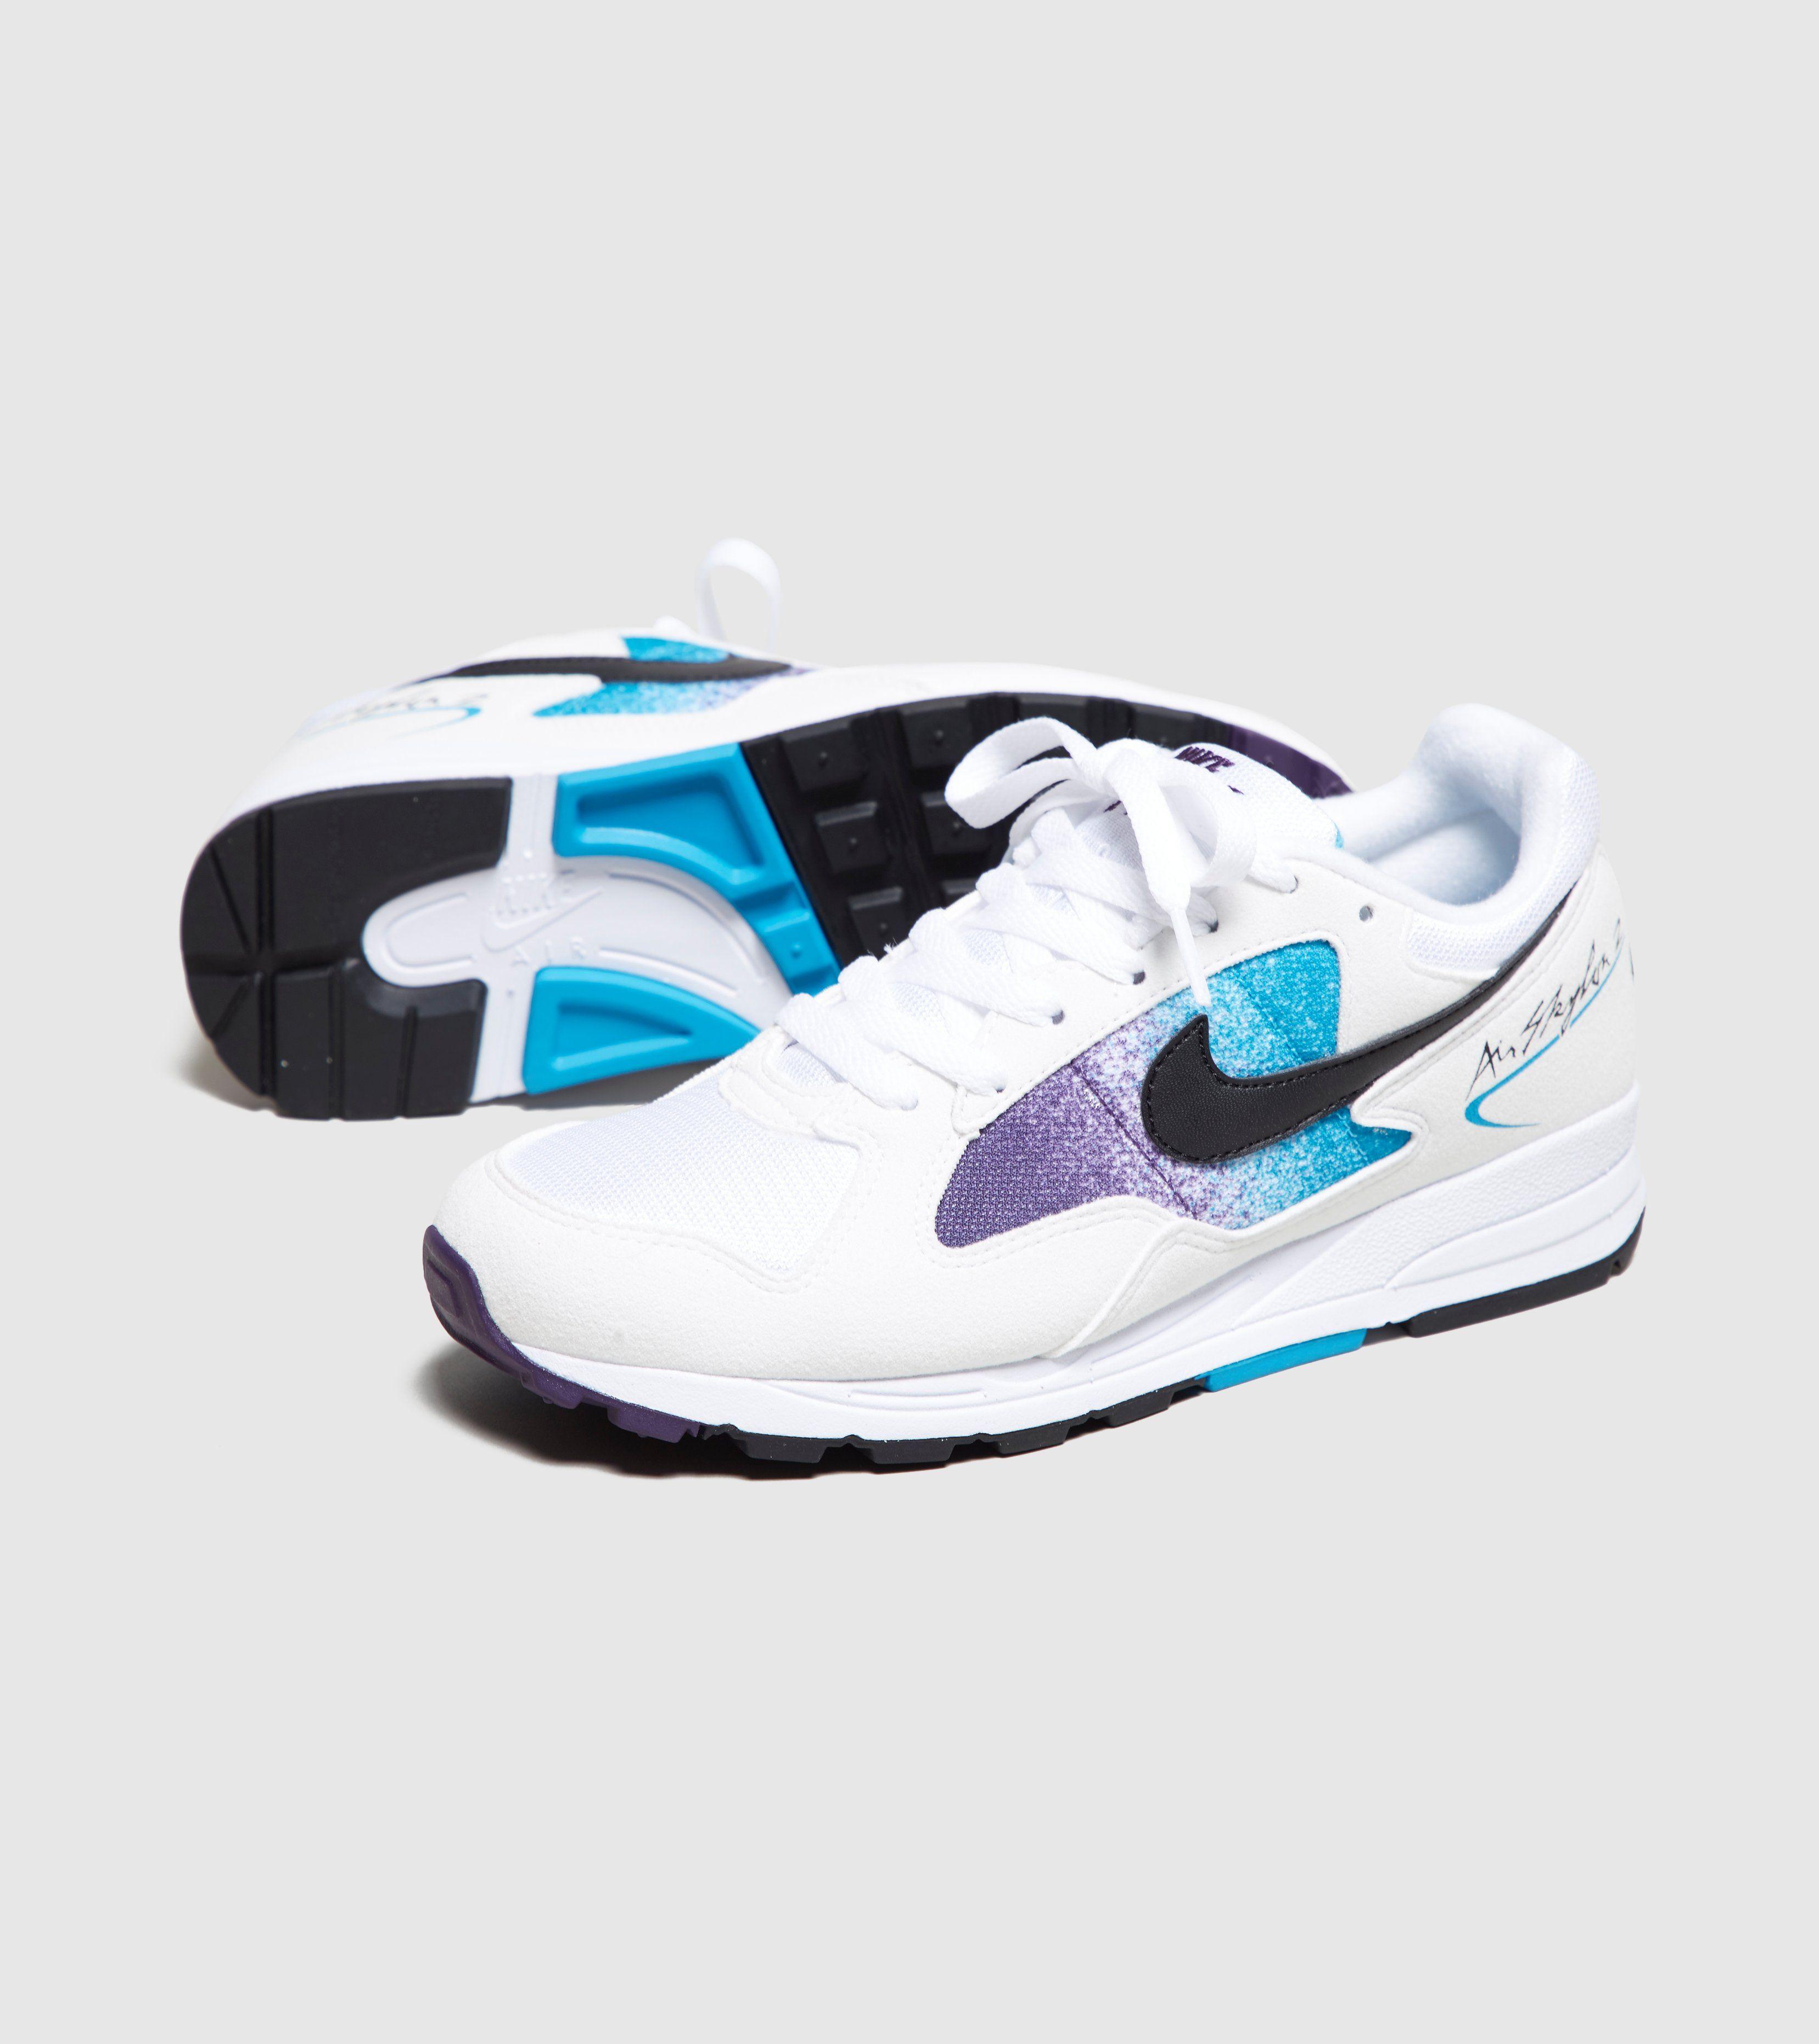 Nike Air Skylon II Femme